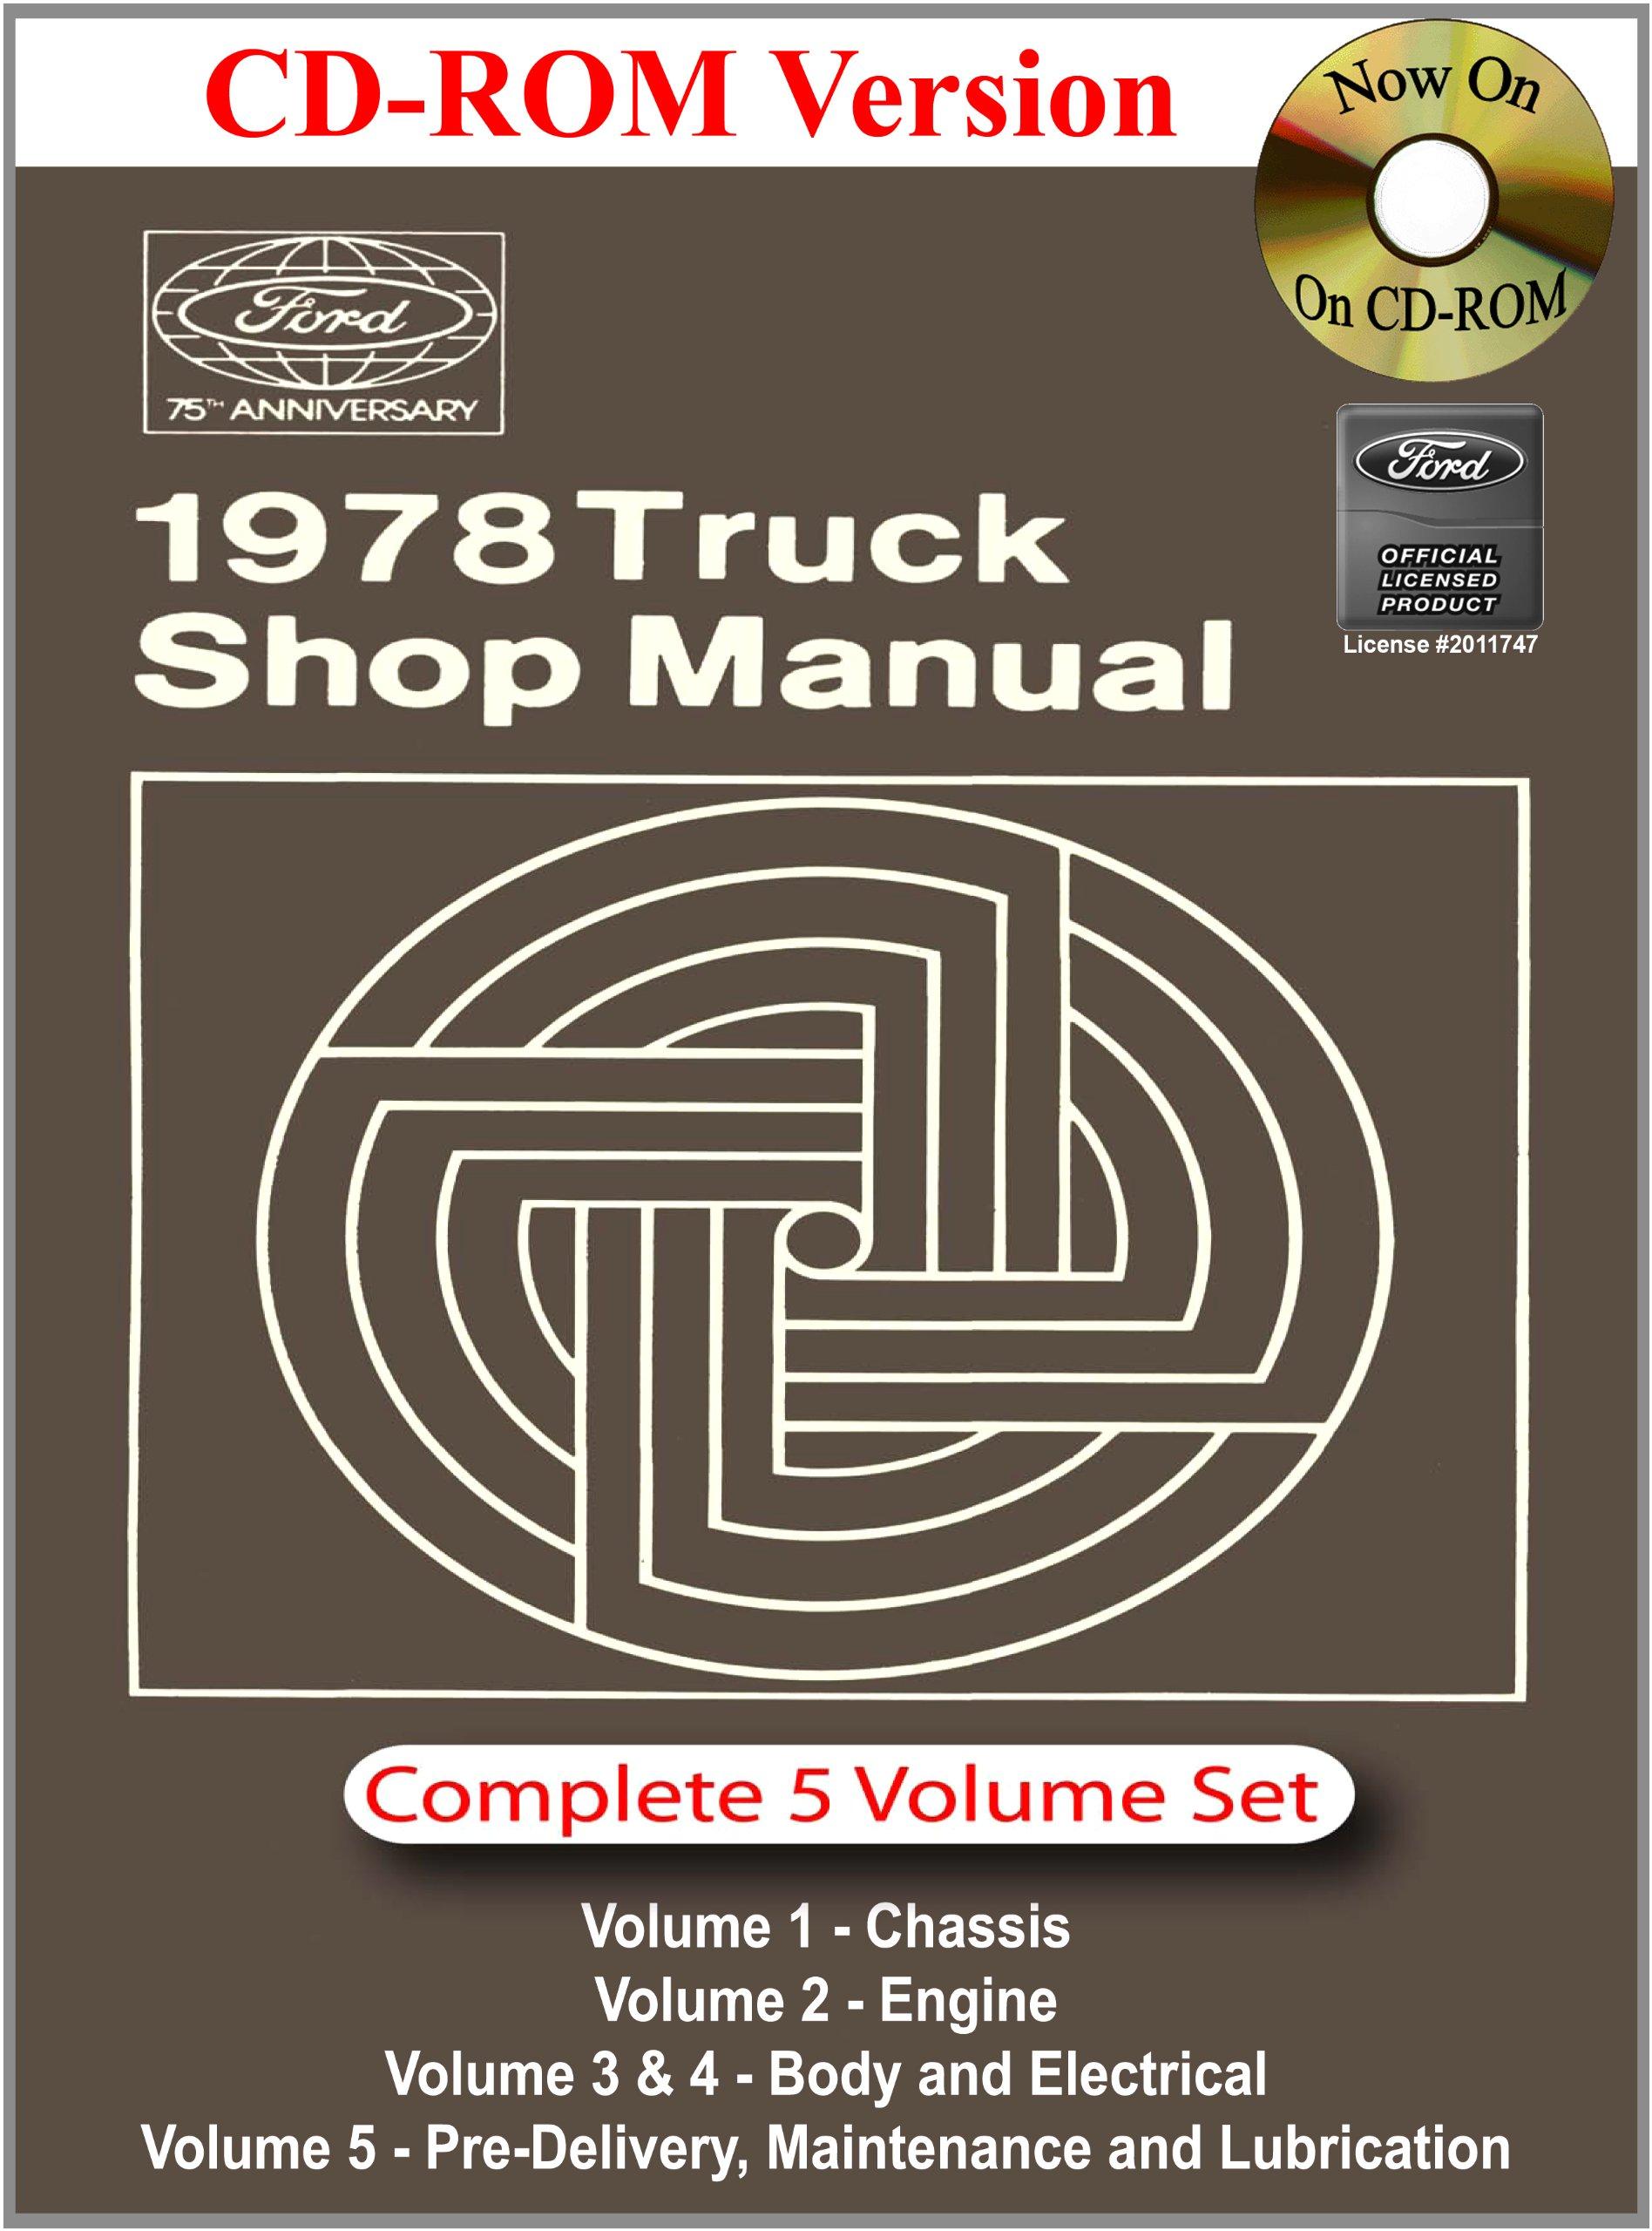 1978 ford truck shop manual ford motor company david e leblanc rh amazon com 2013 Ford F-150 Manual Ford F-150 Repair